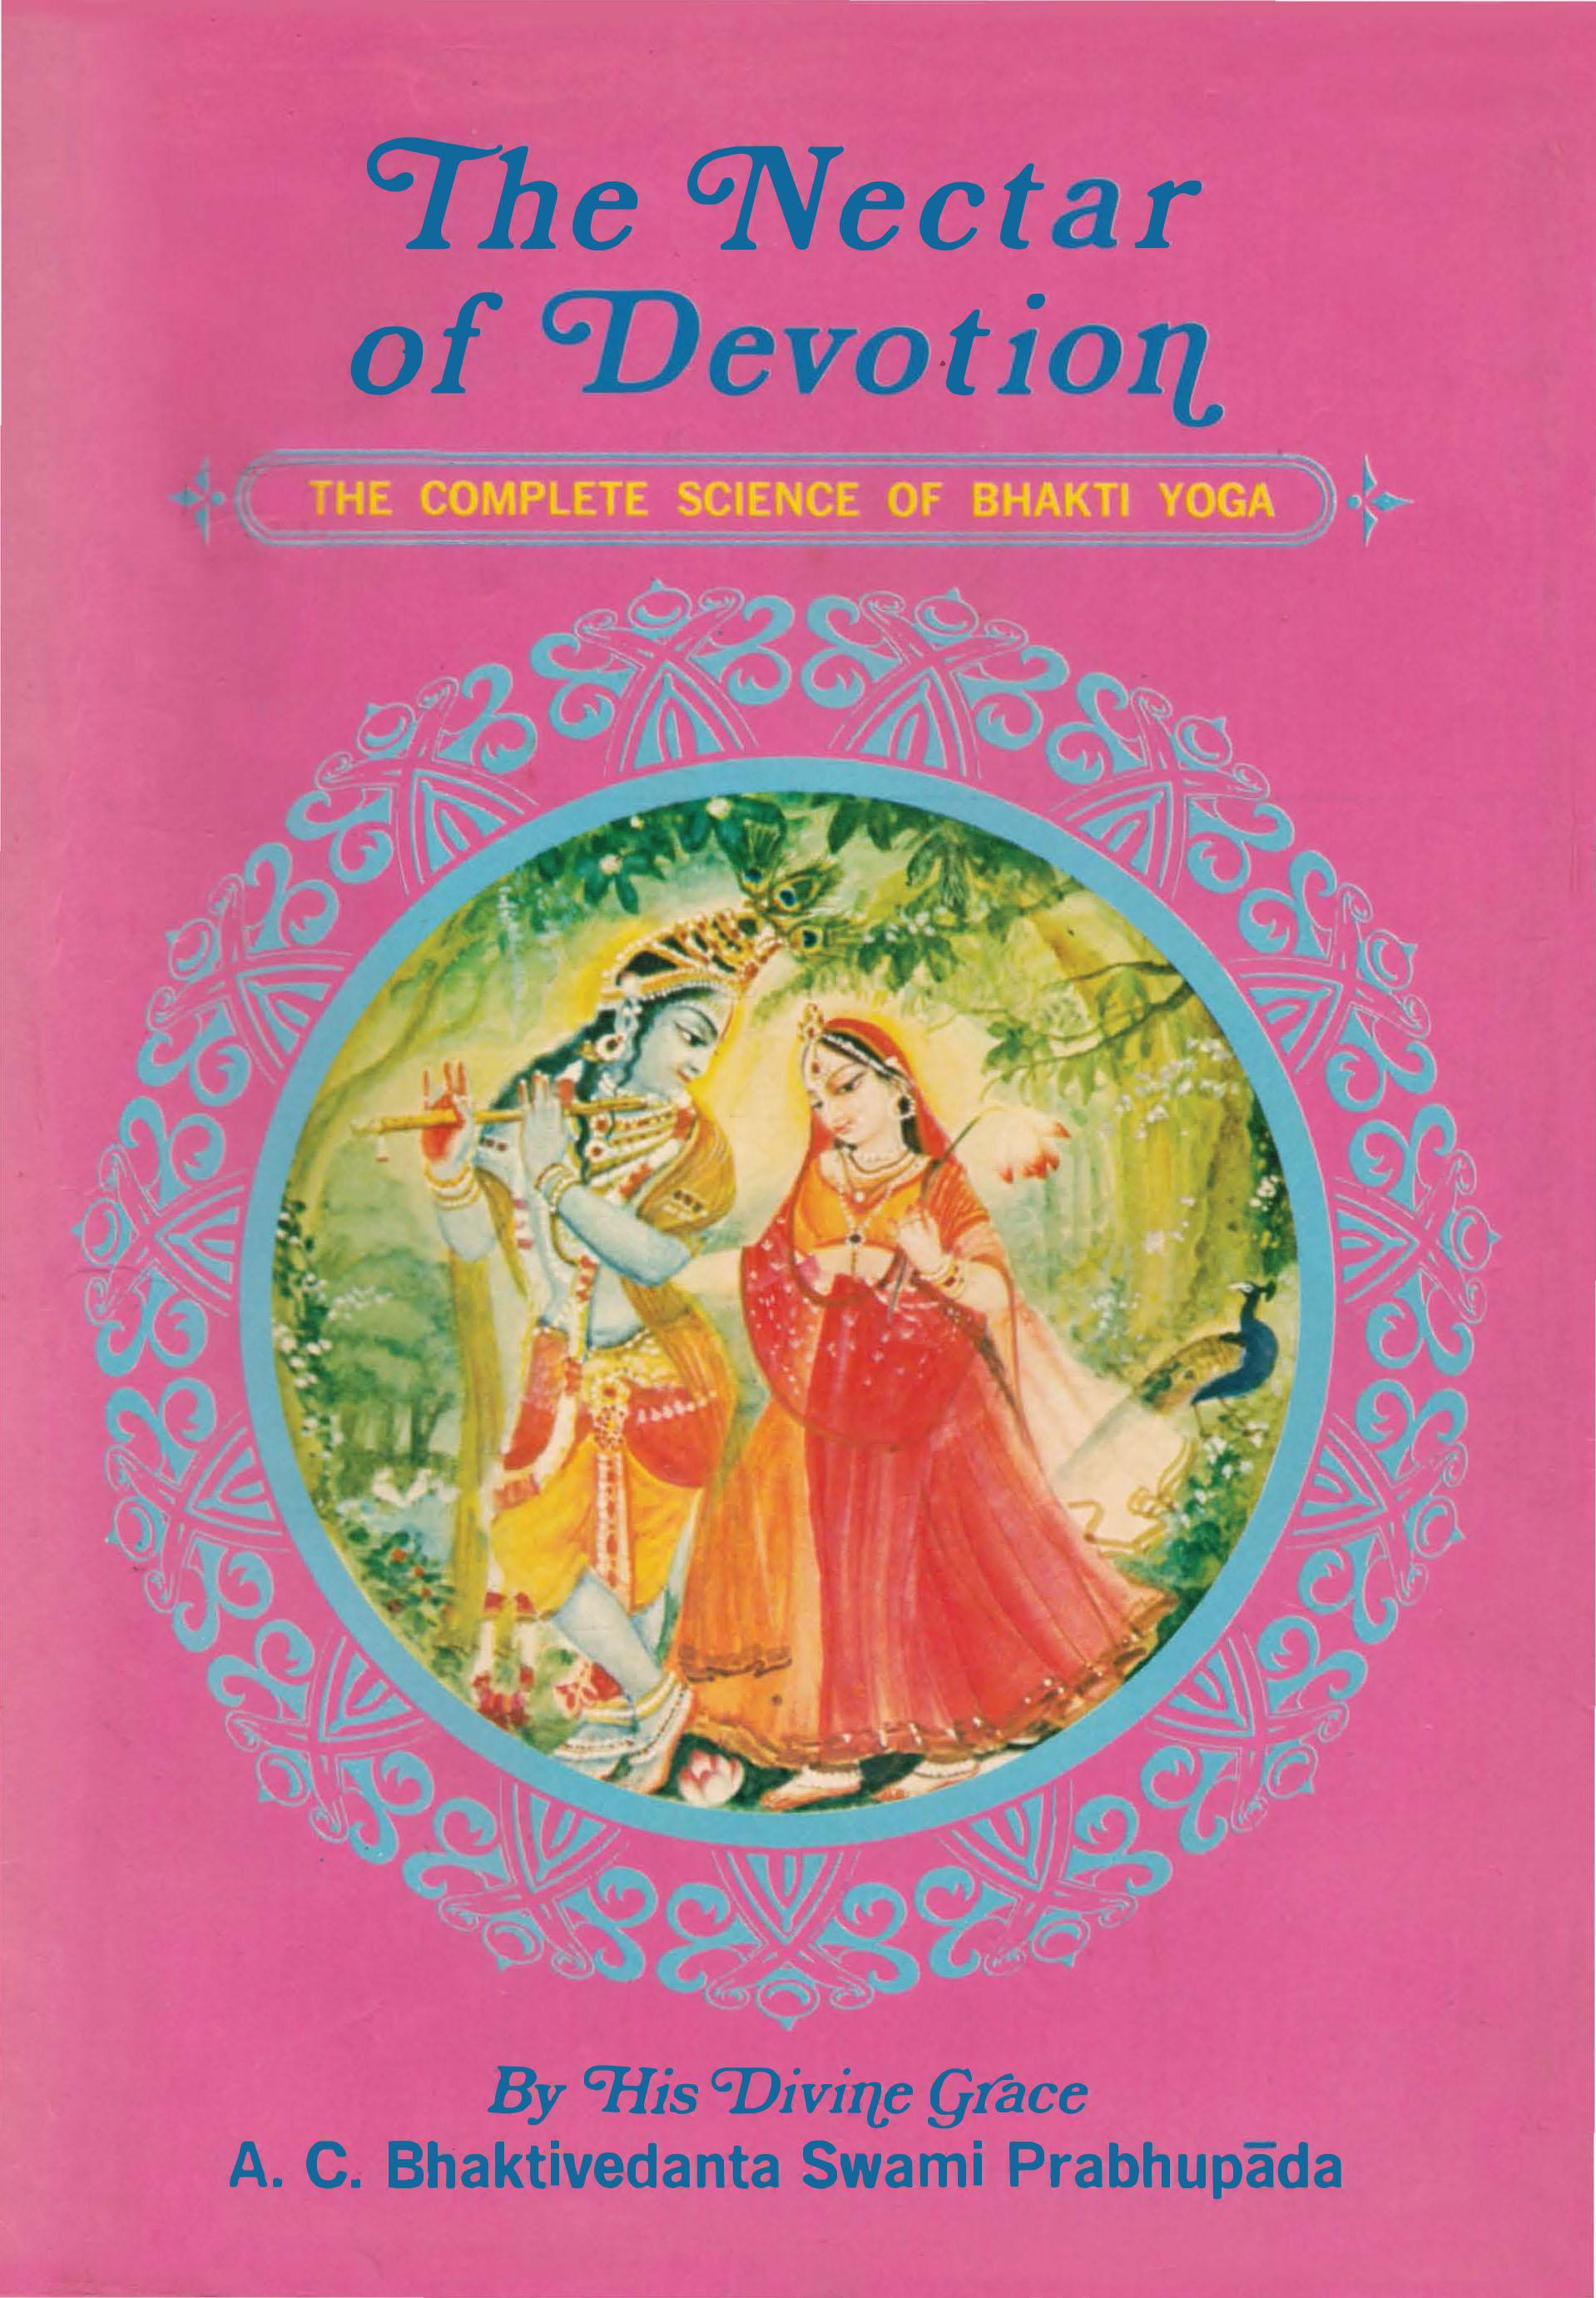 The Nectar of Devotion - 1970 ISKCON press edition SCAN